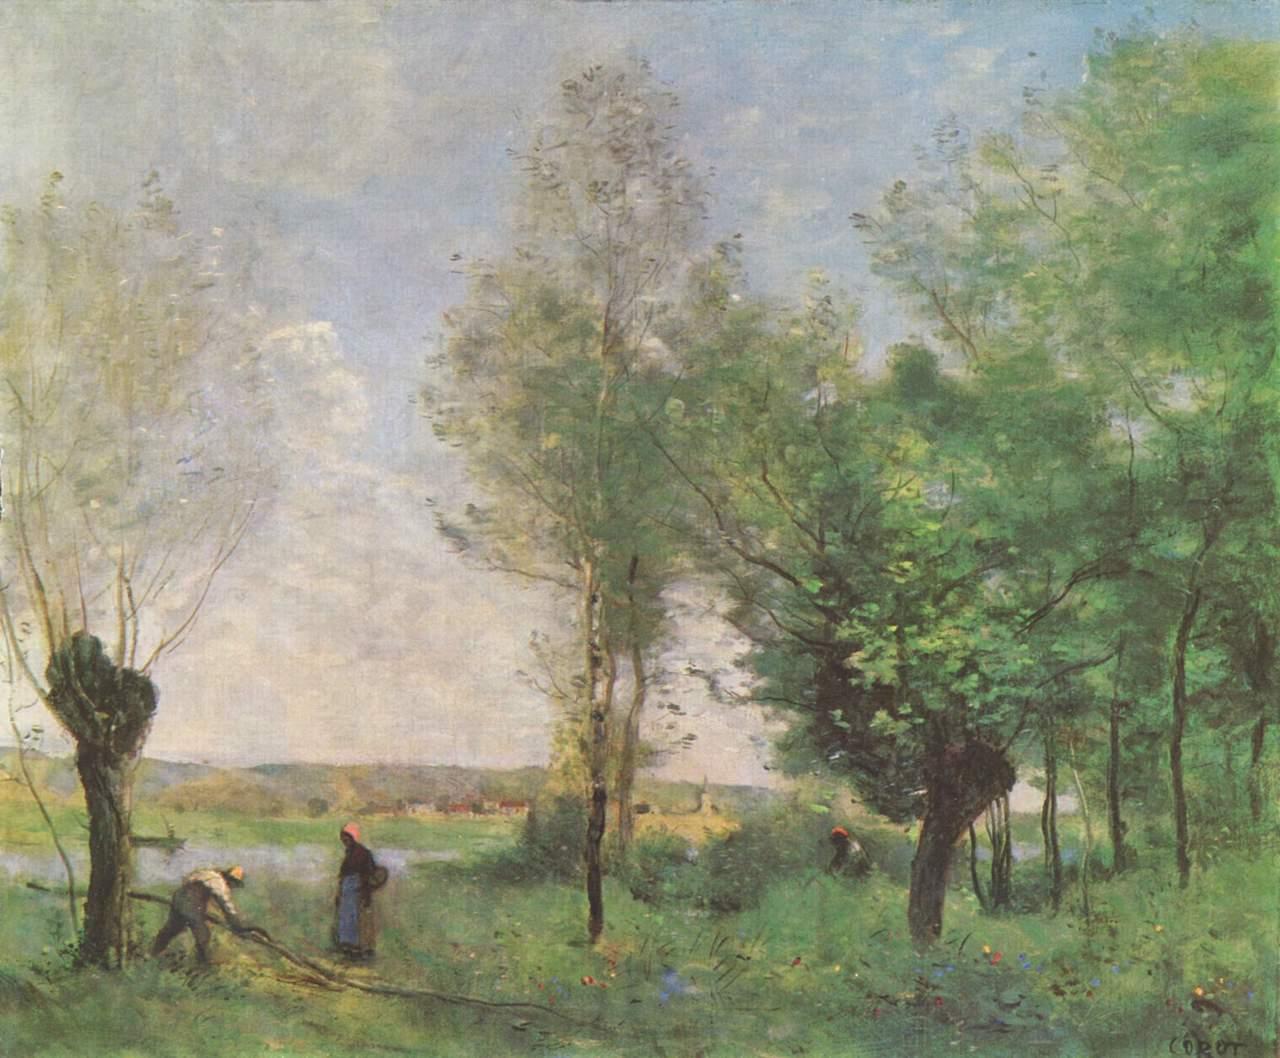 Jean-Baptiste-Camille Corot. Erinnerung an Coubron. 1872. Öl / Leinwand. 46 x 55,3cm